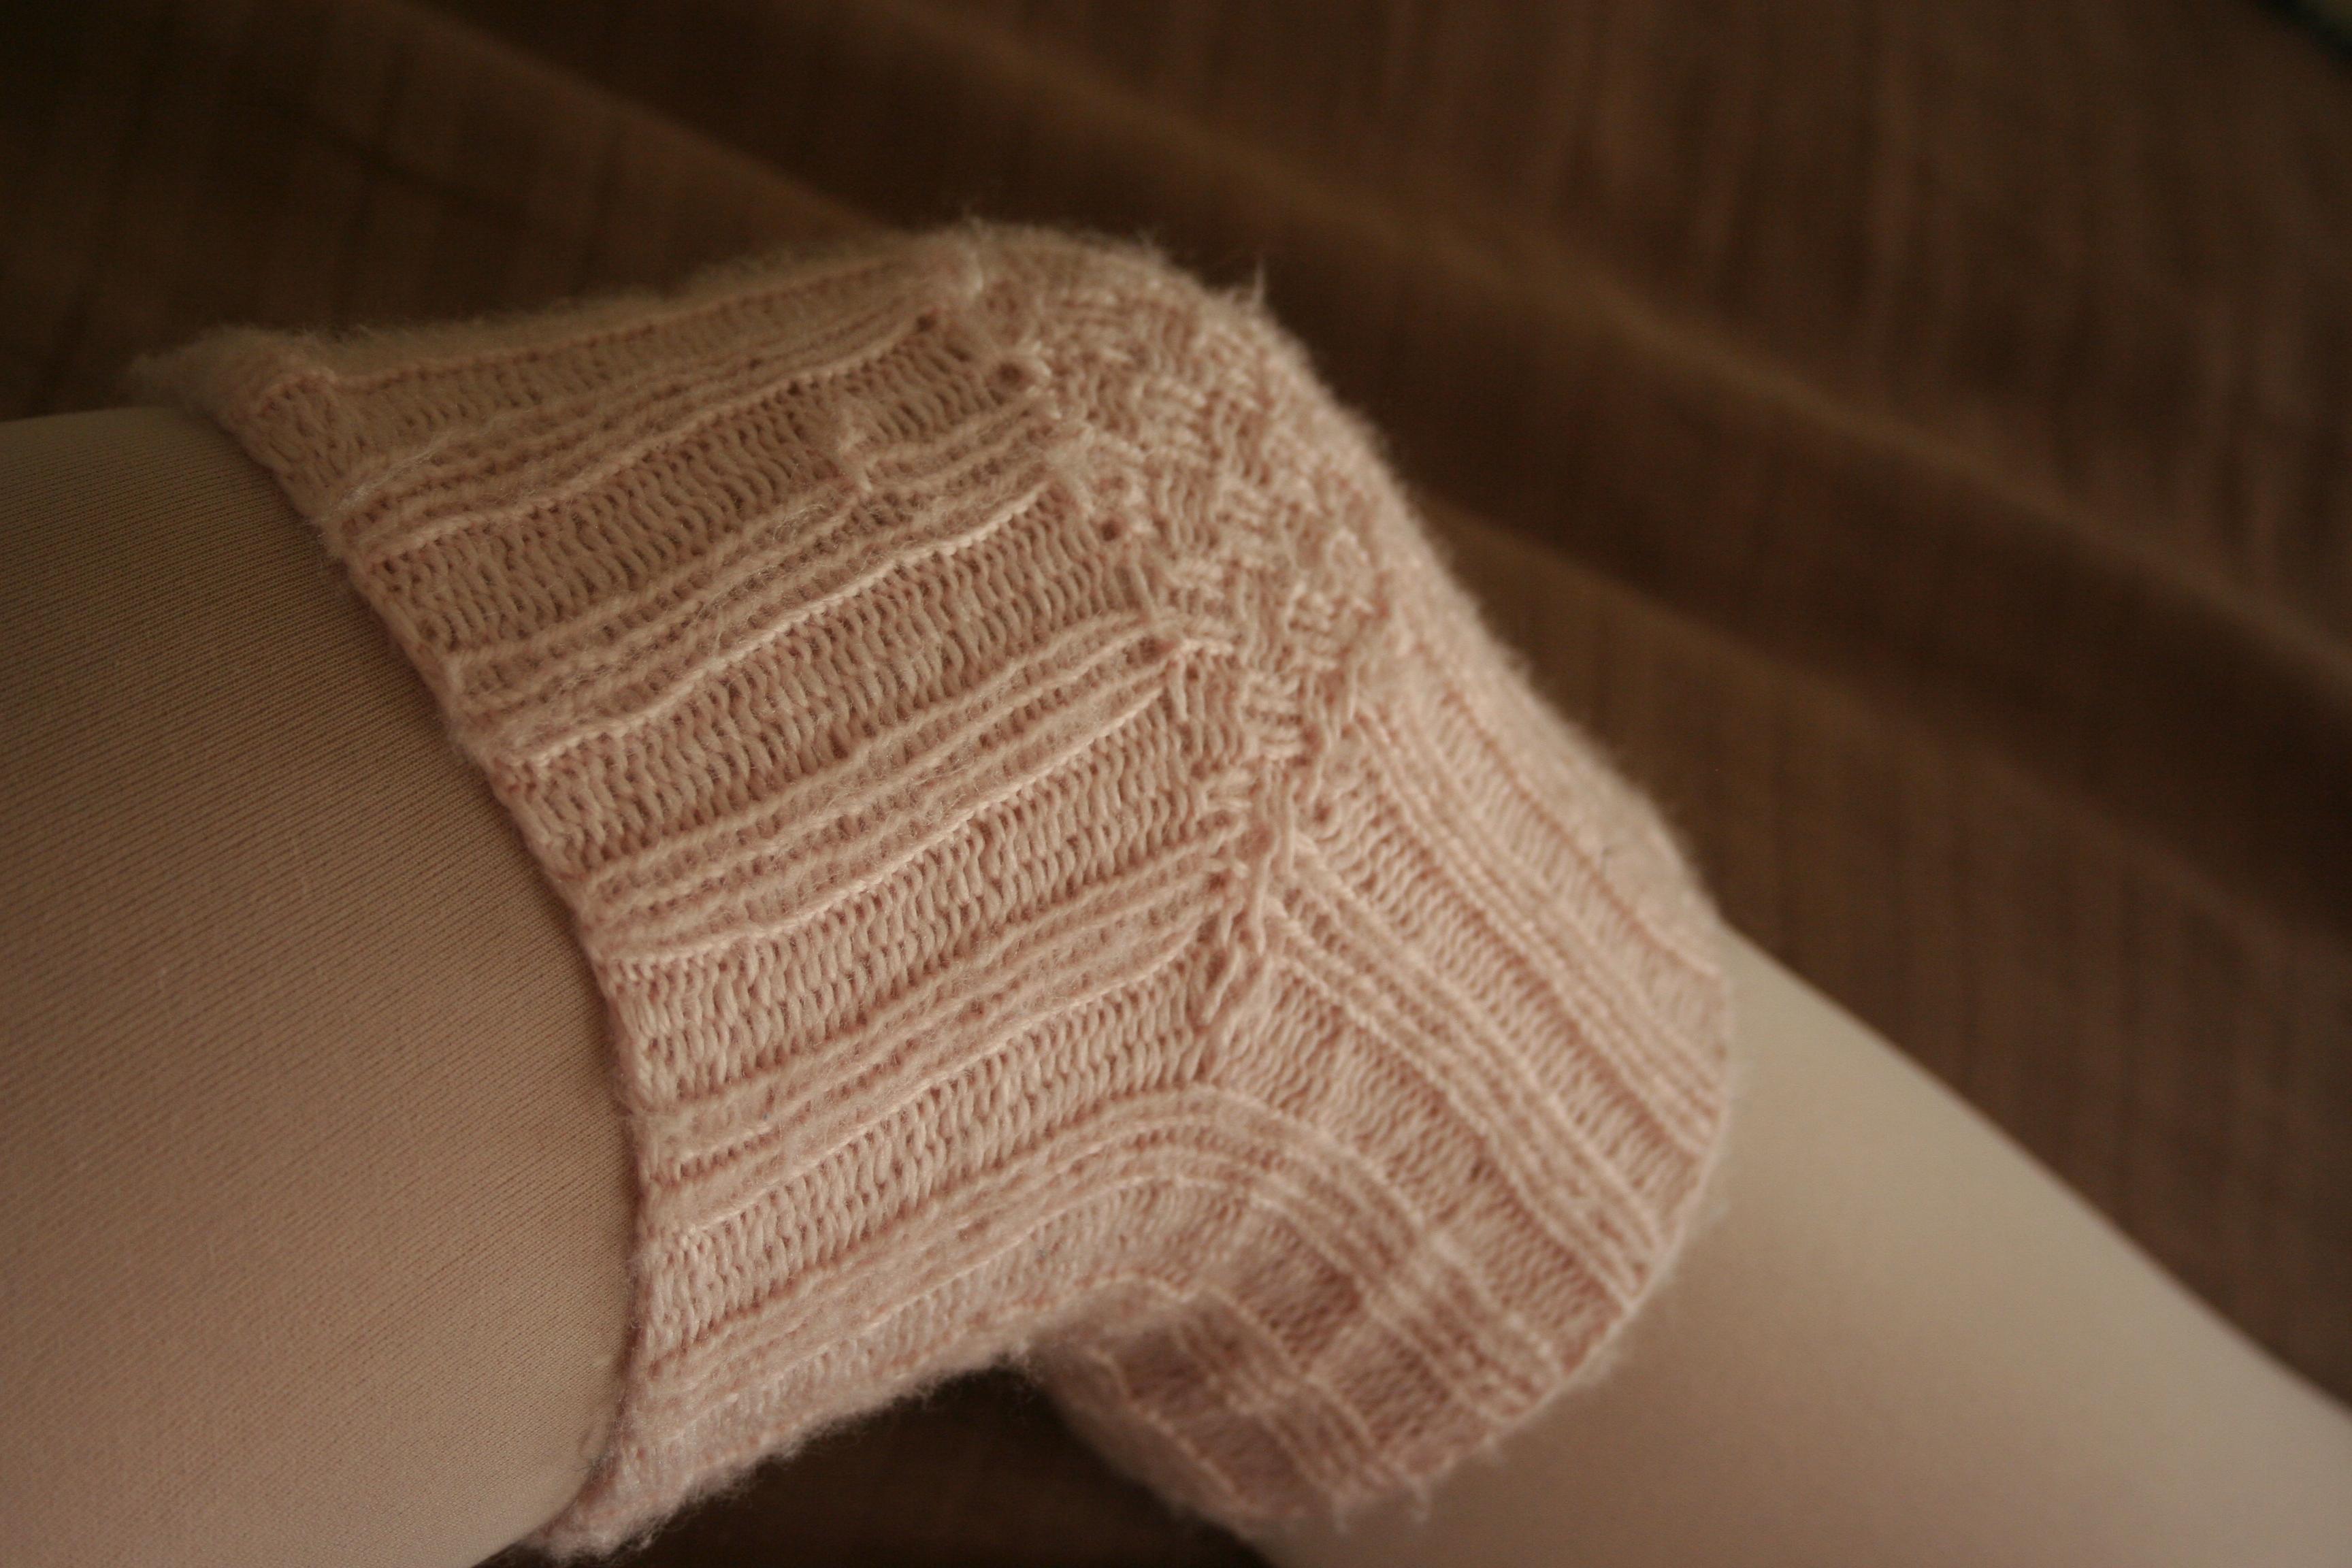 Knitting Pattern Leg Warmers Straight Needles : knit knee warmers Archives - Adult Ballerina Project